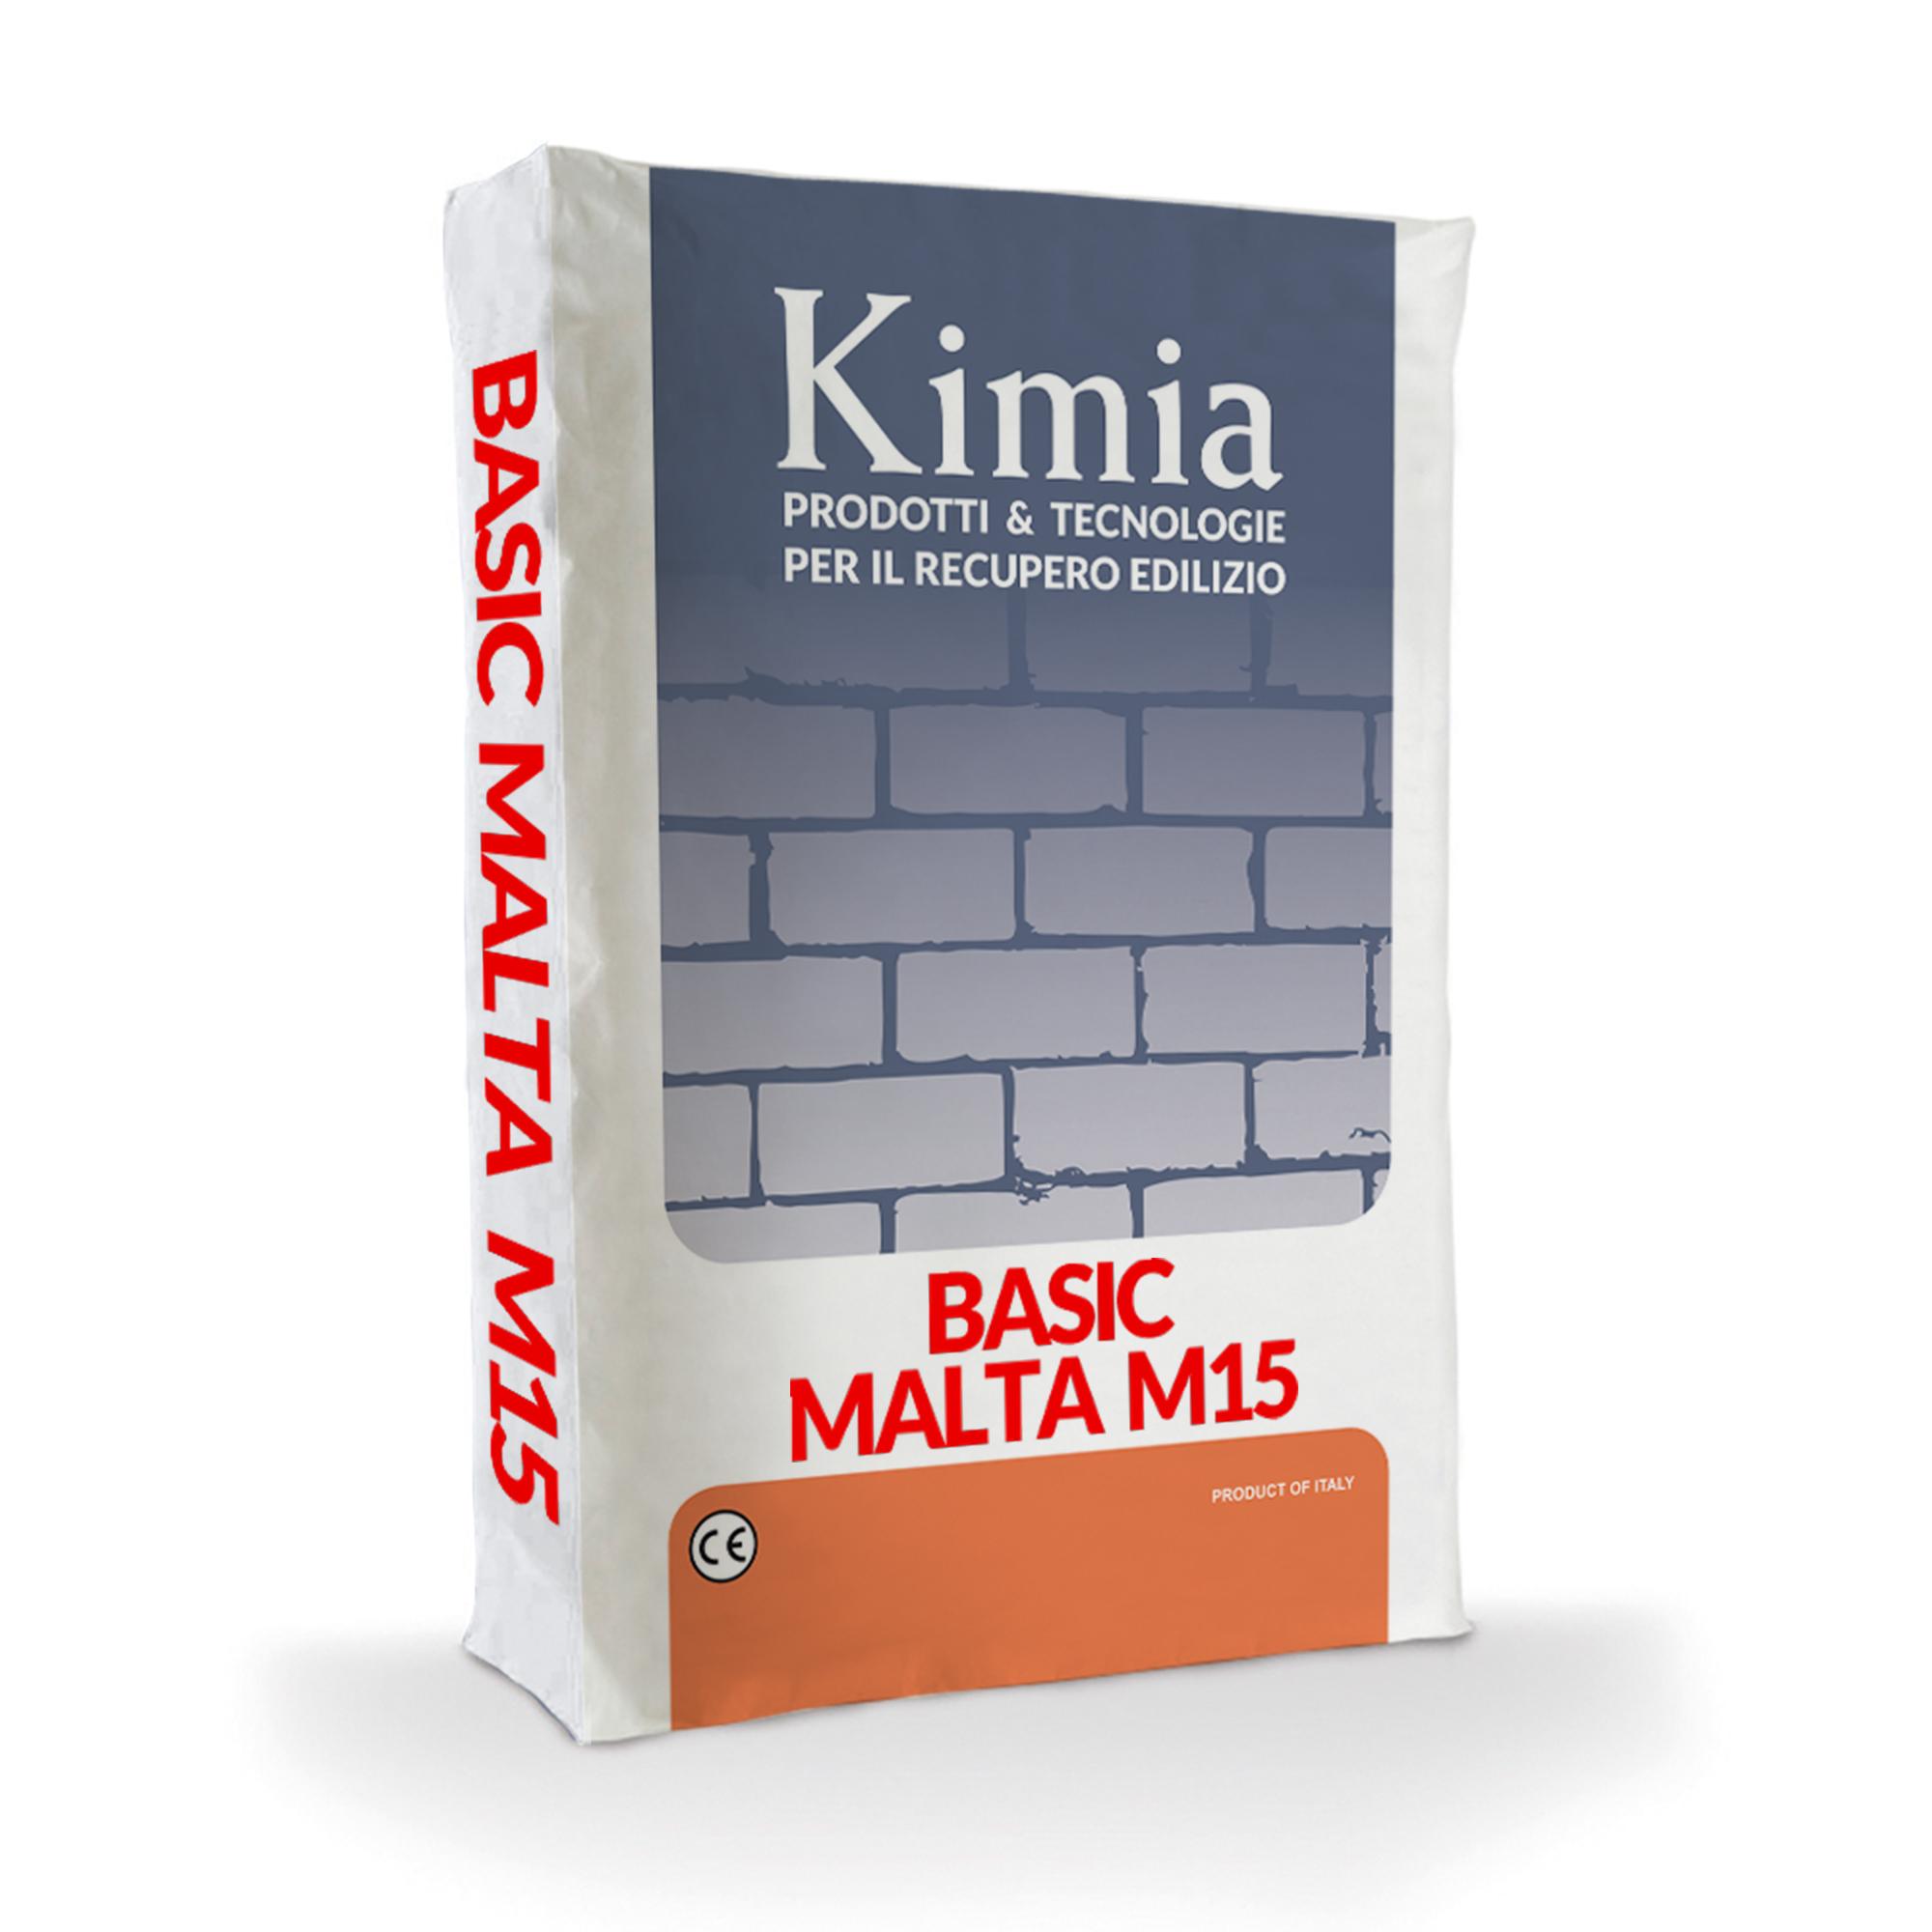 Basic MALTA M15